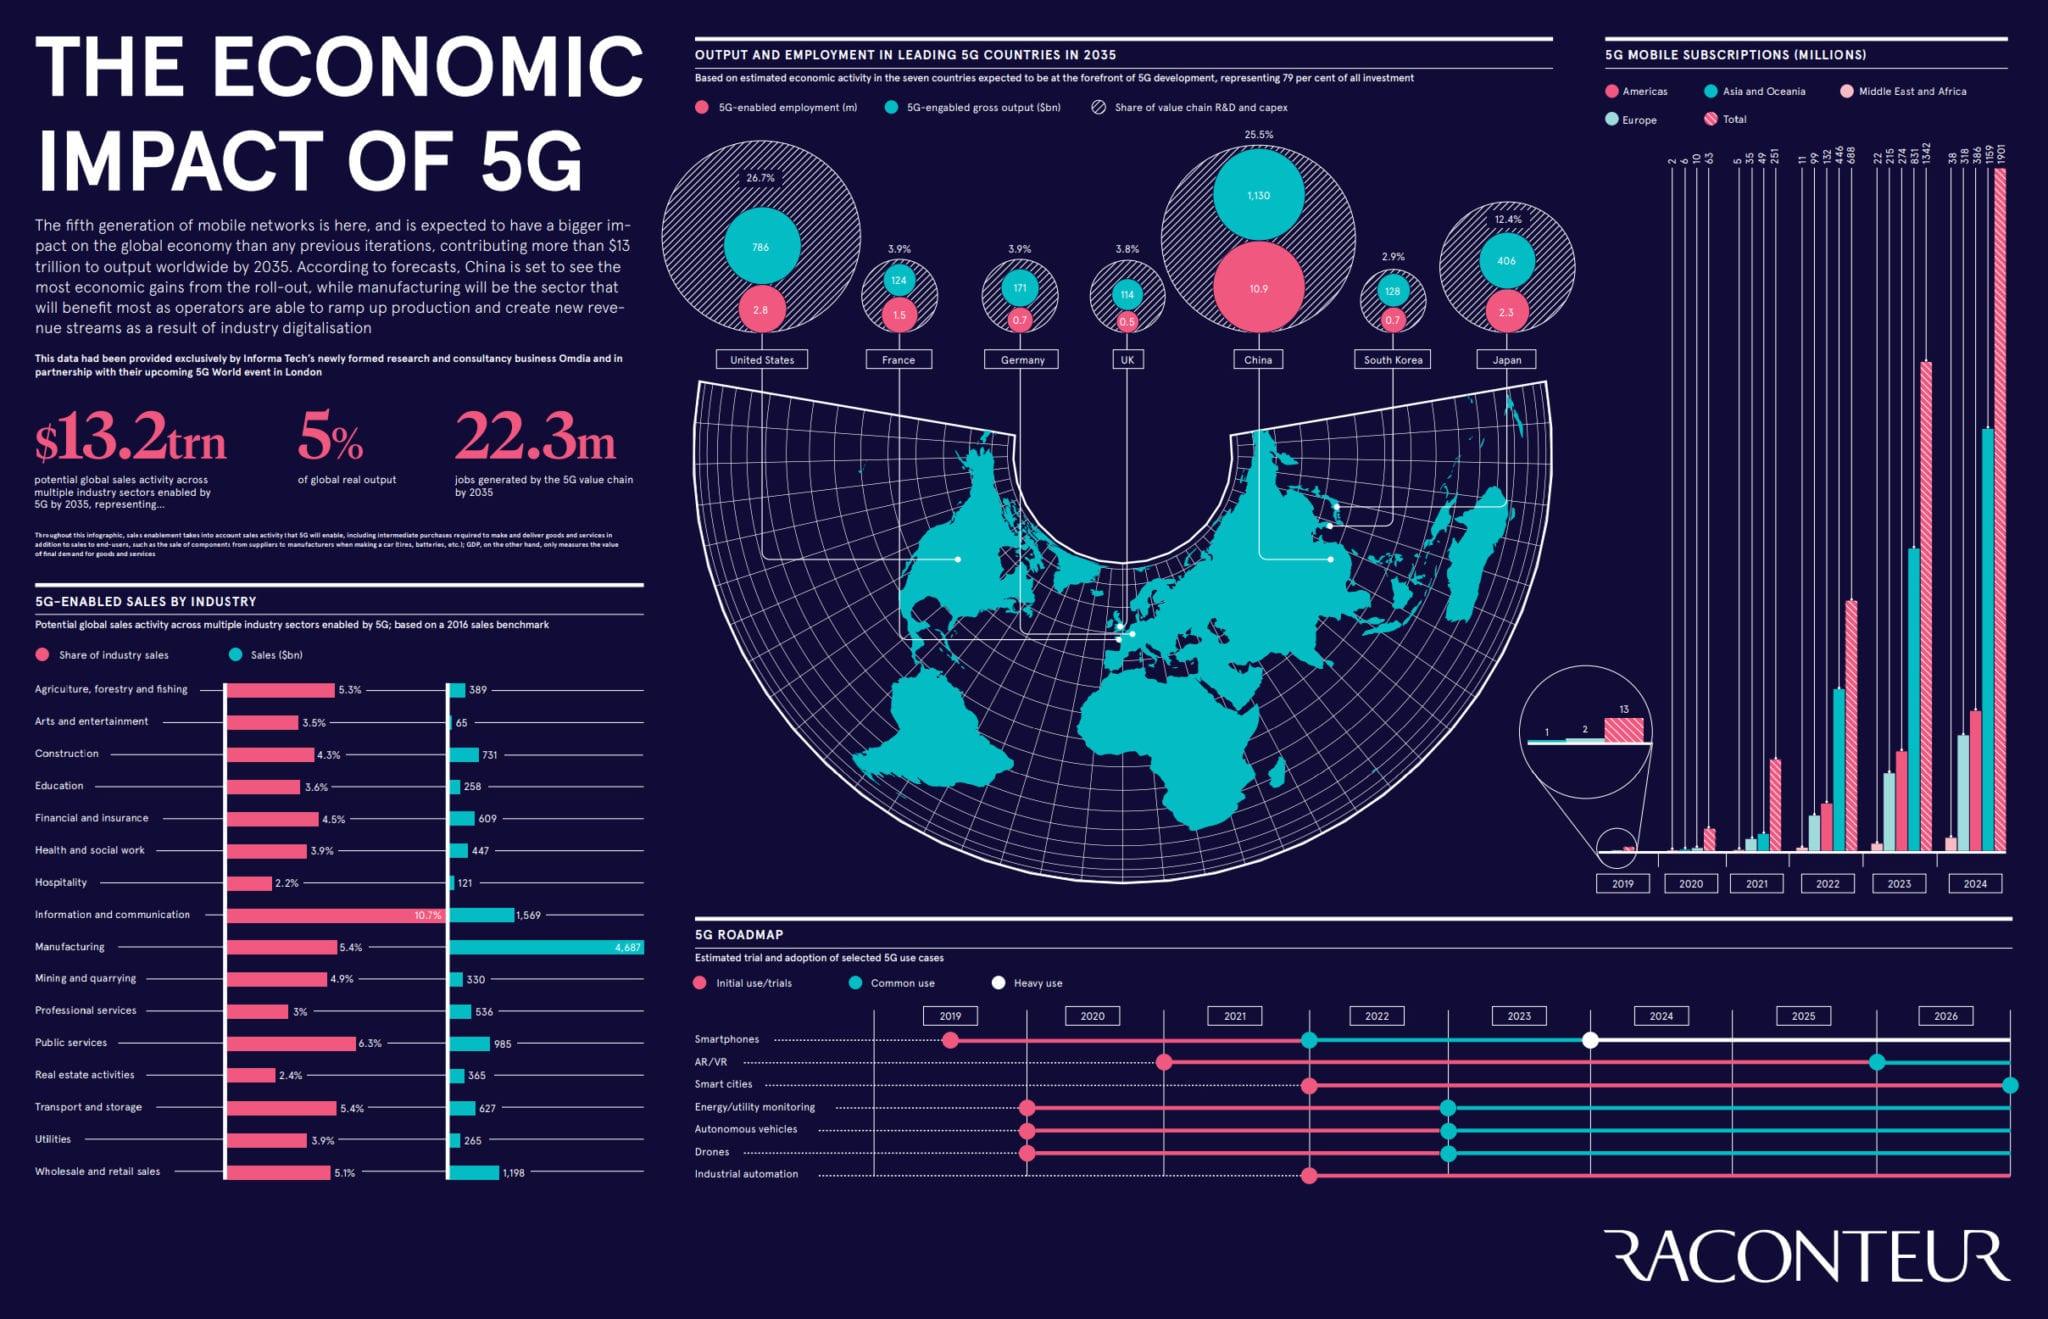 statistics on economic impact of 5g in Canada